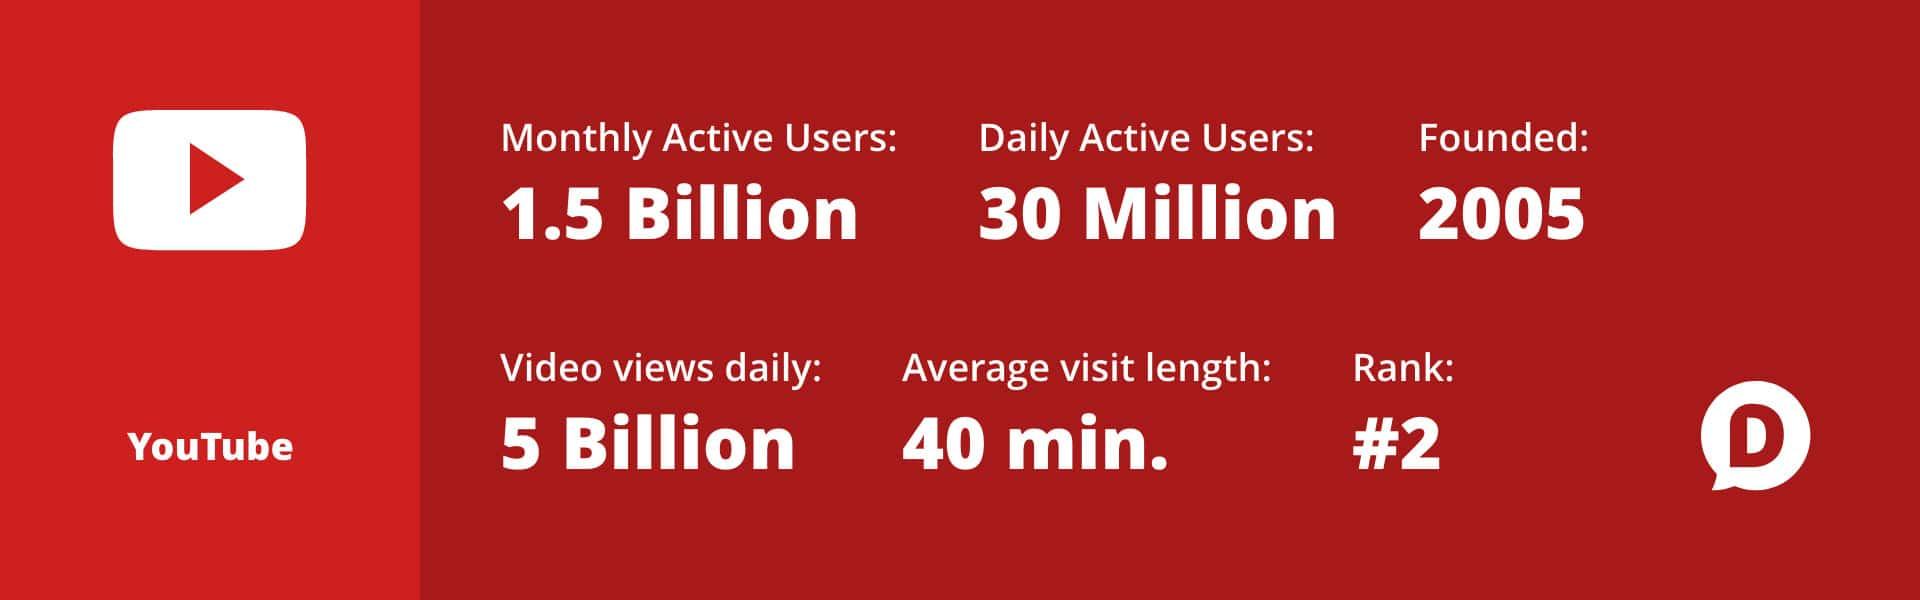 YouTube statistics for 2018